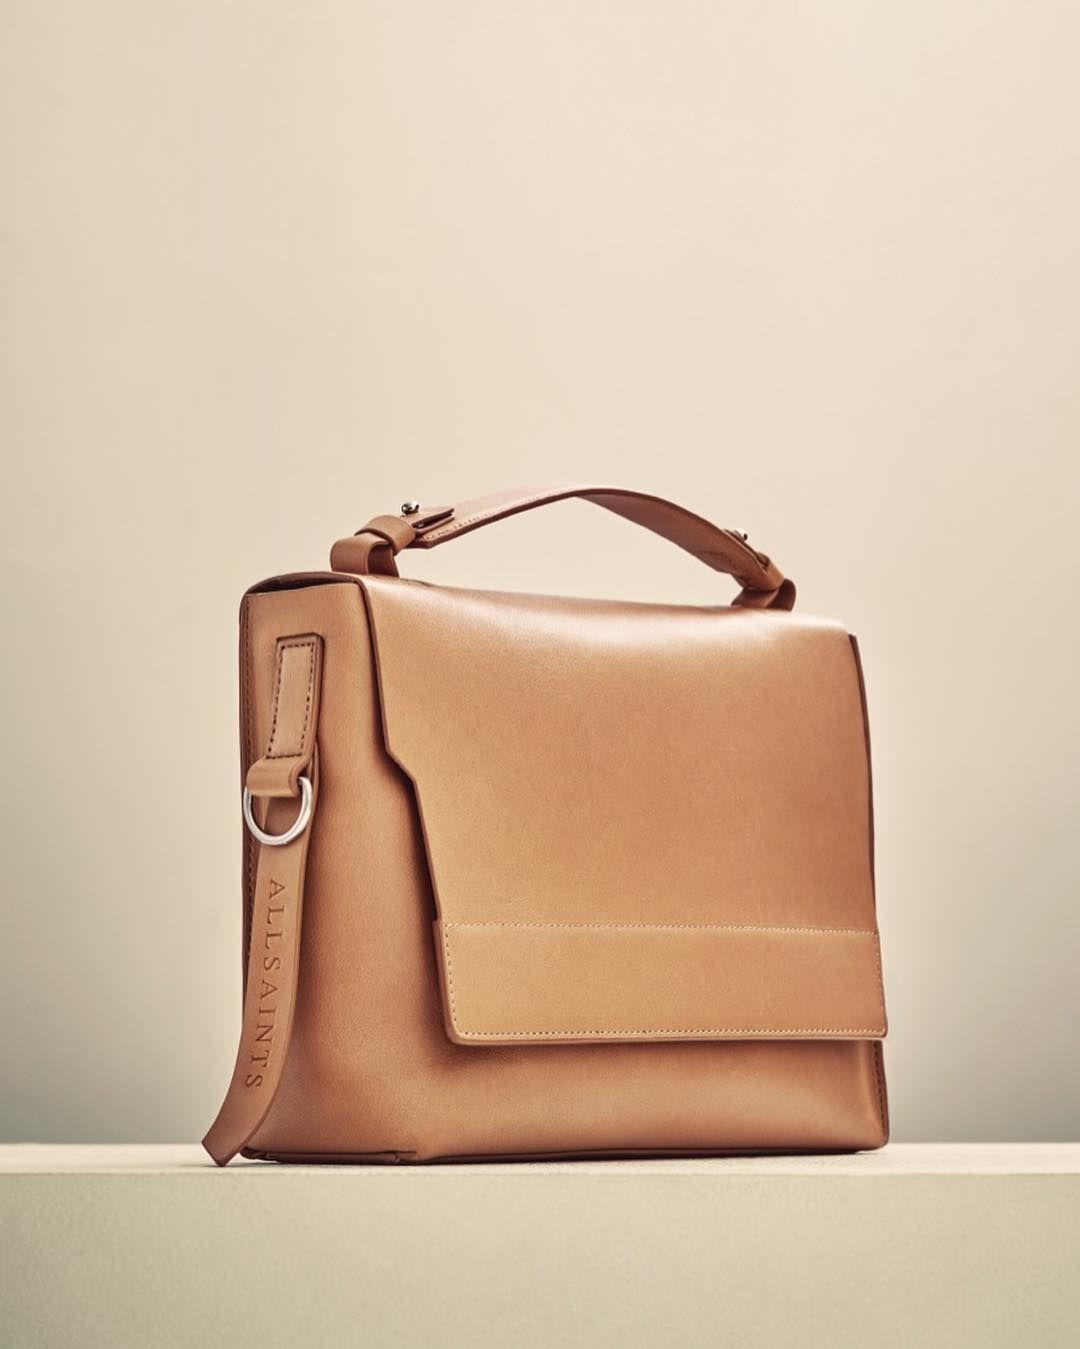 deda04247 The Capital Collection: The Paradise Shoulder Bag | Women's Fashion ...